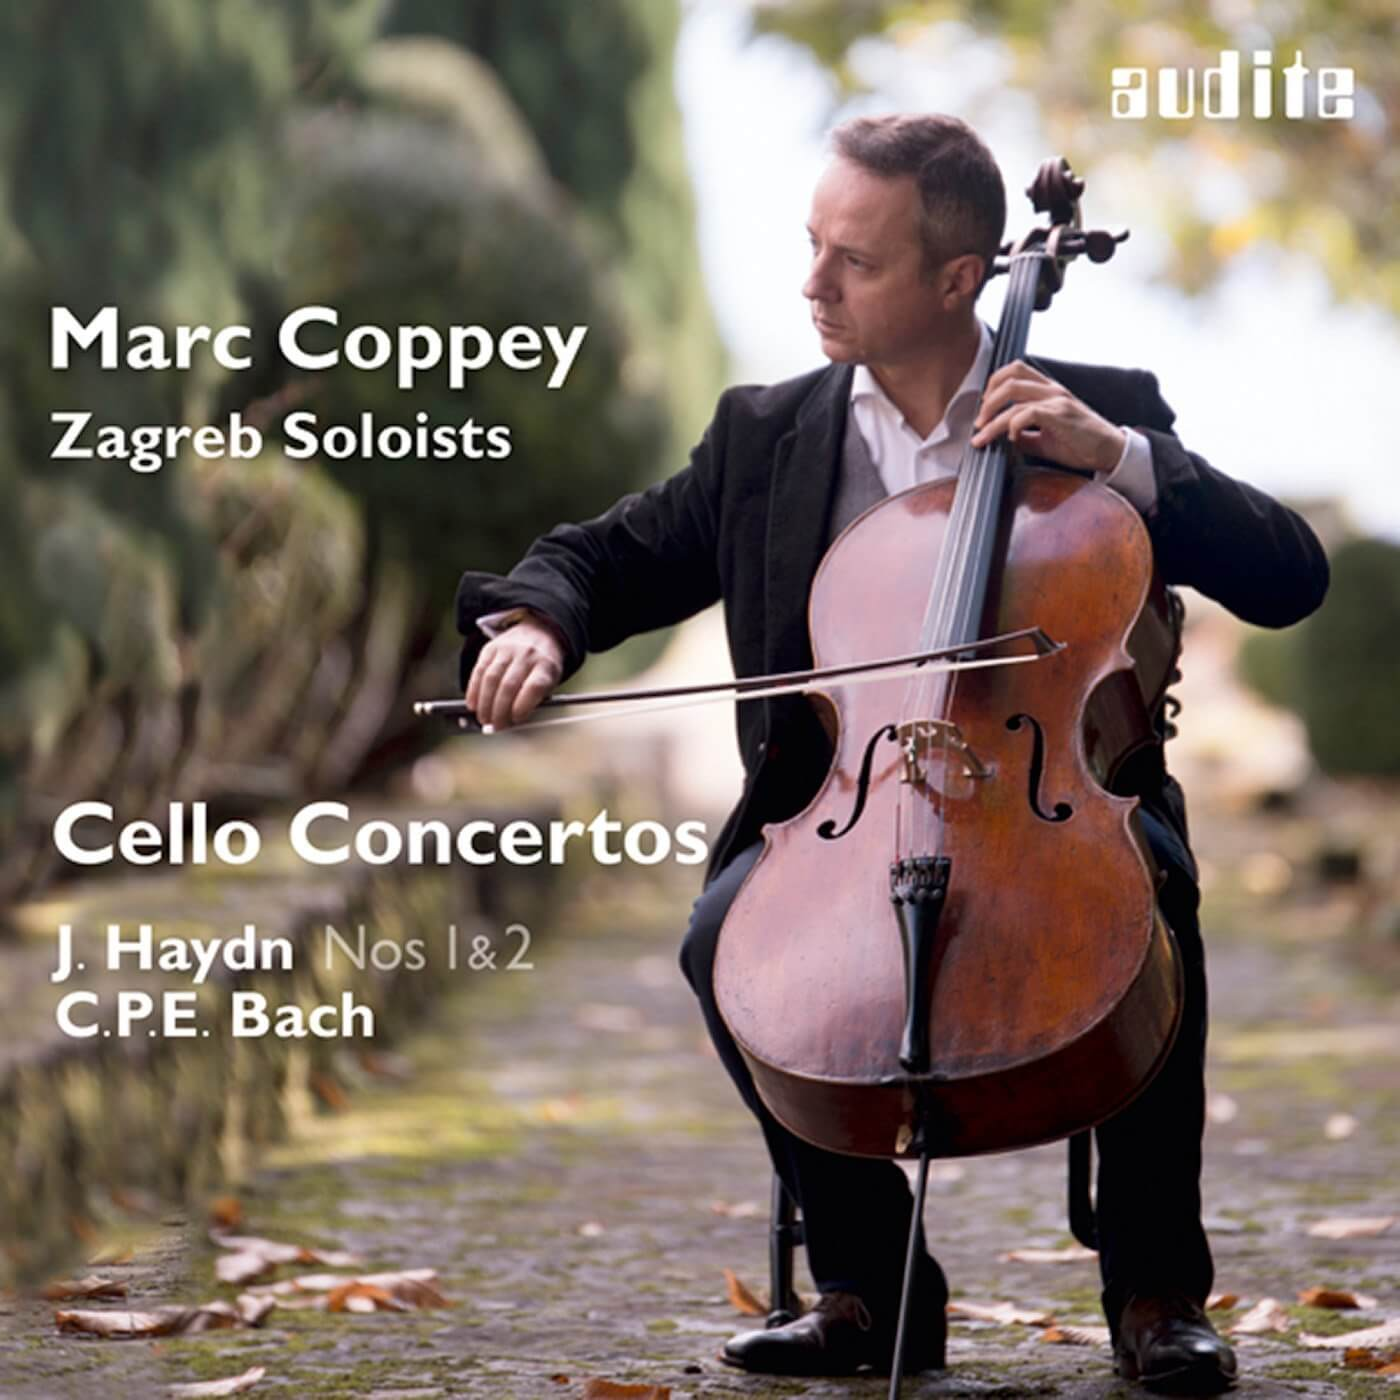 Zagrebacki solisti recent-discography Marc Coppey